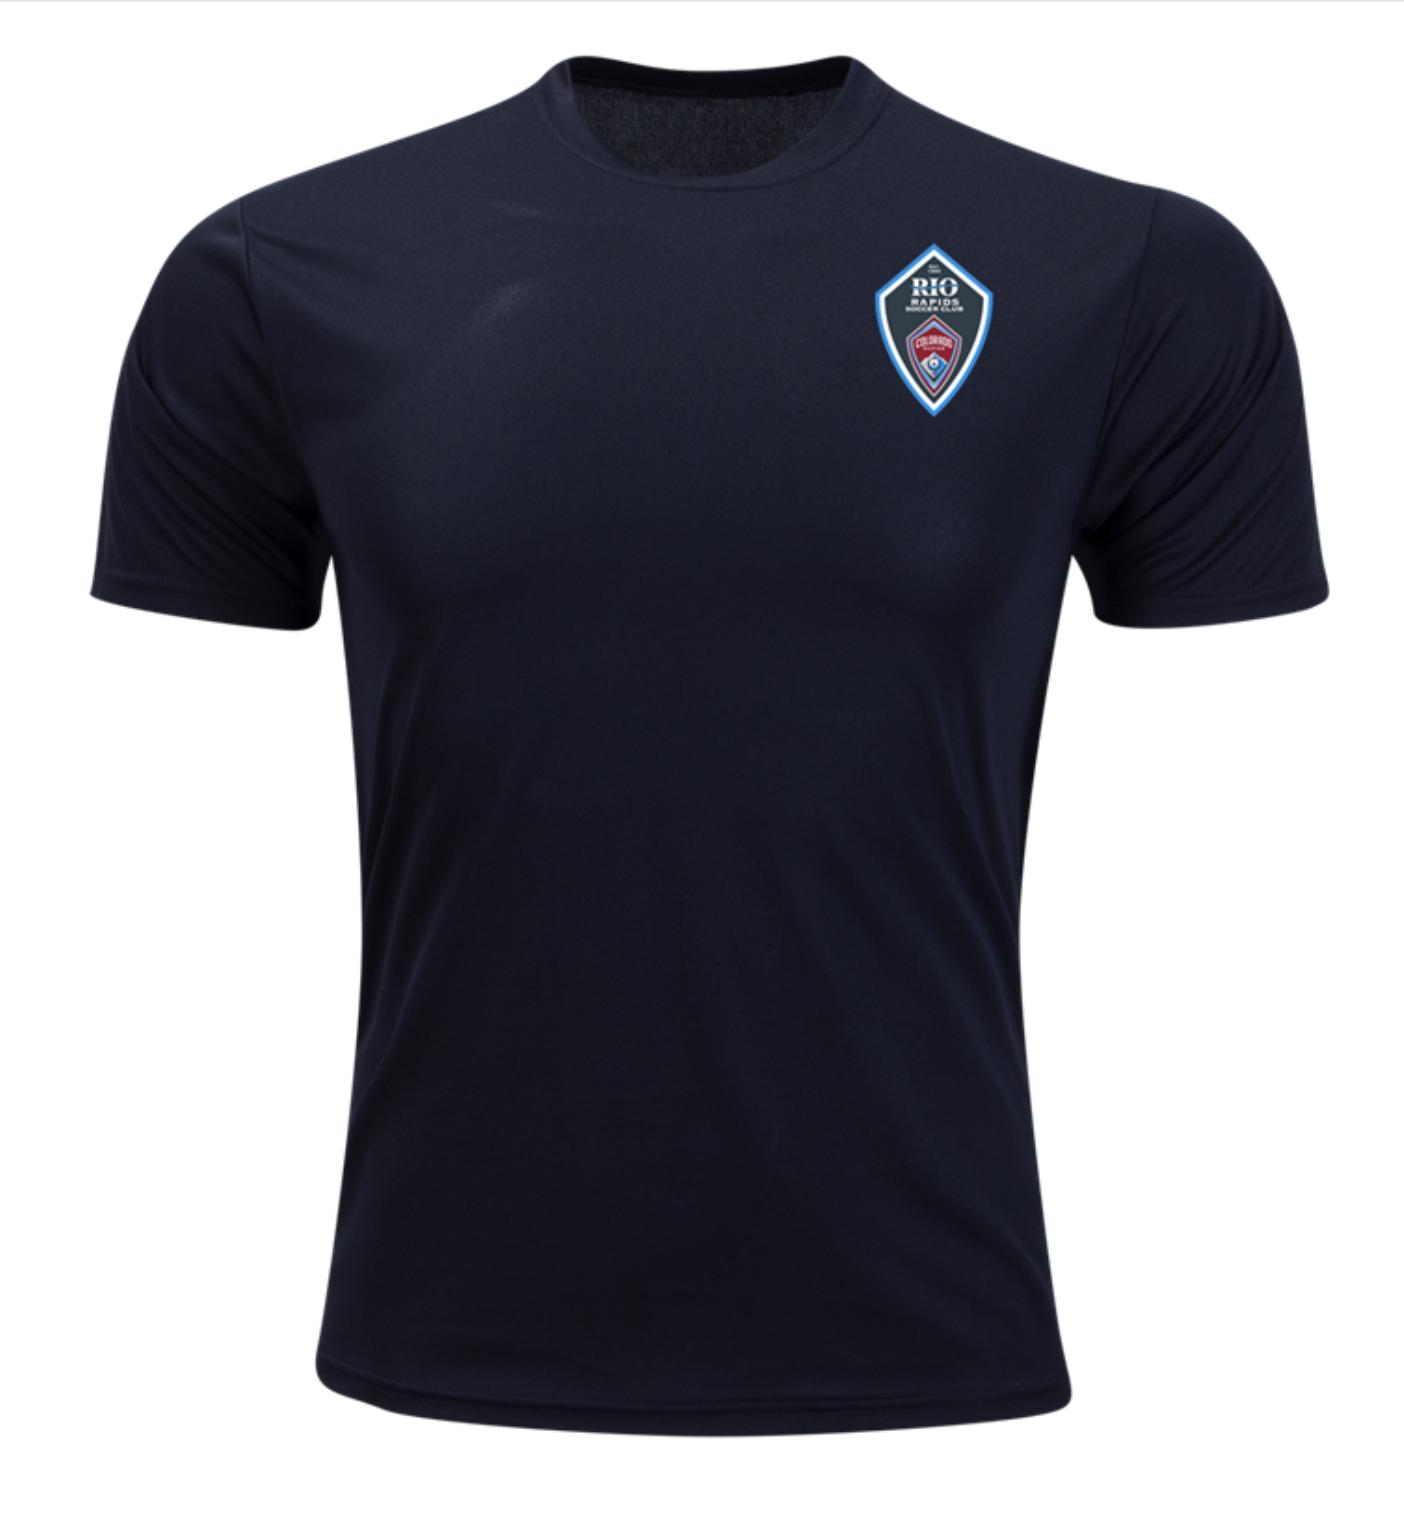 6606a26b200 Fan Team Wear - Rio Rapids Soccer Club